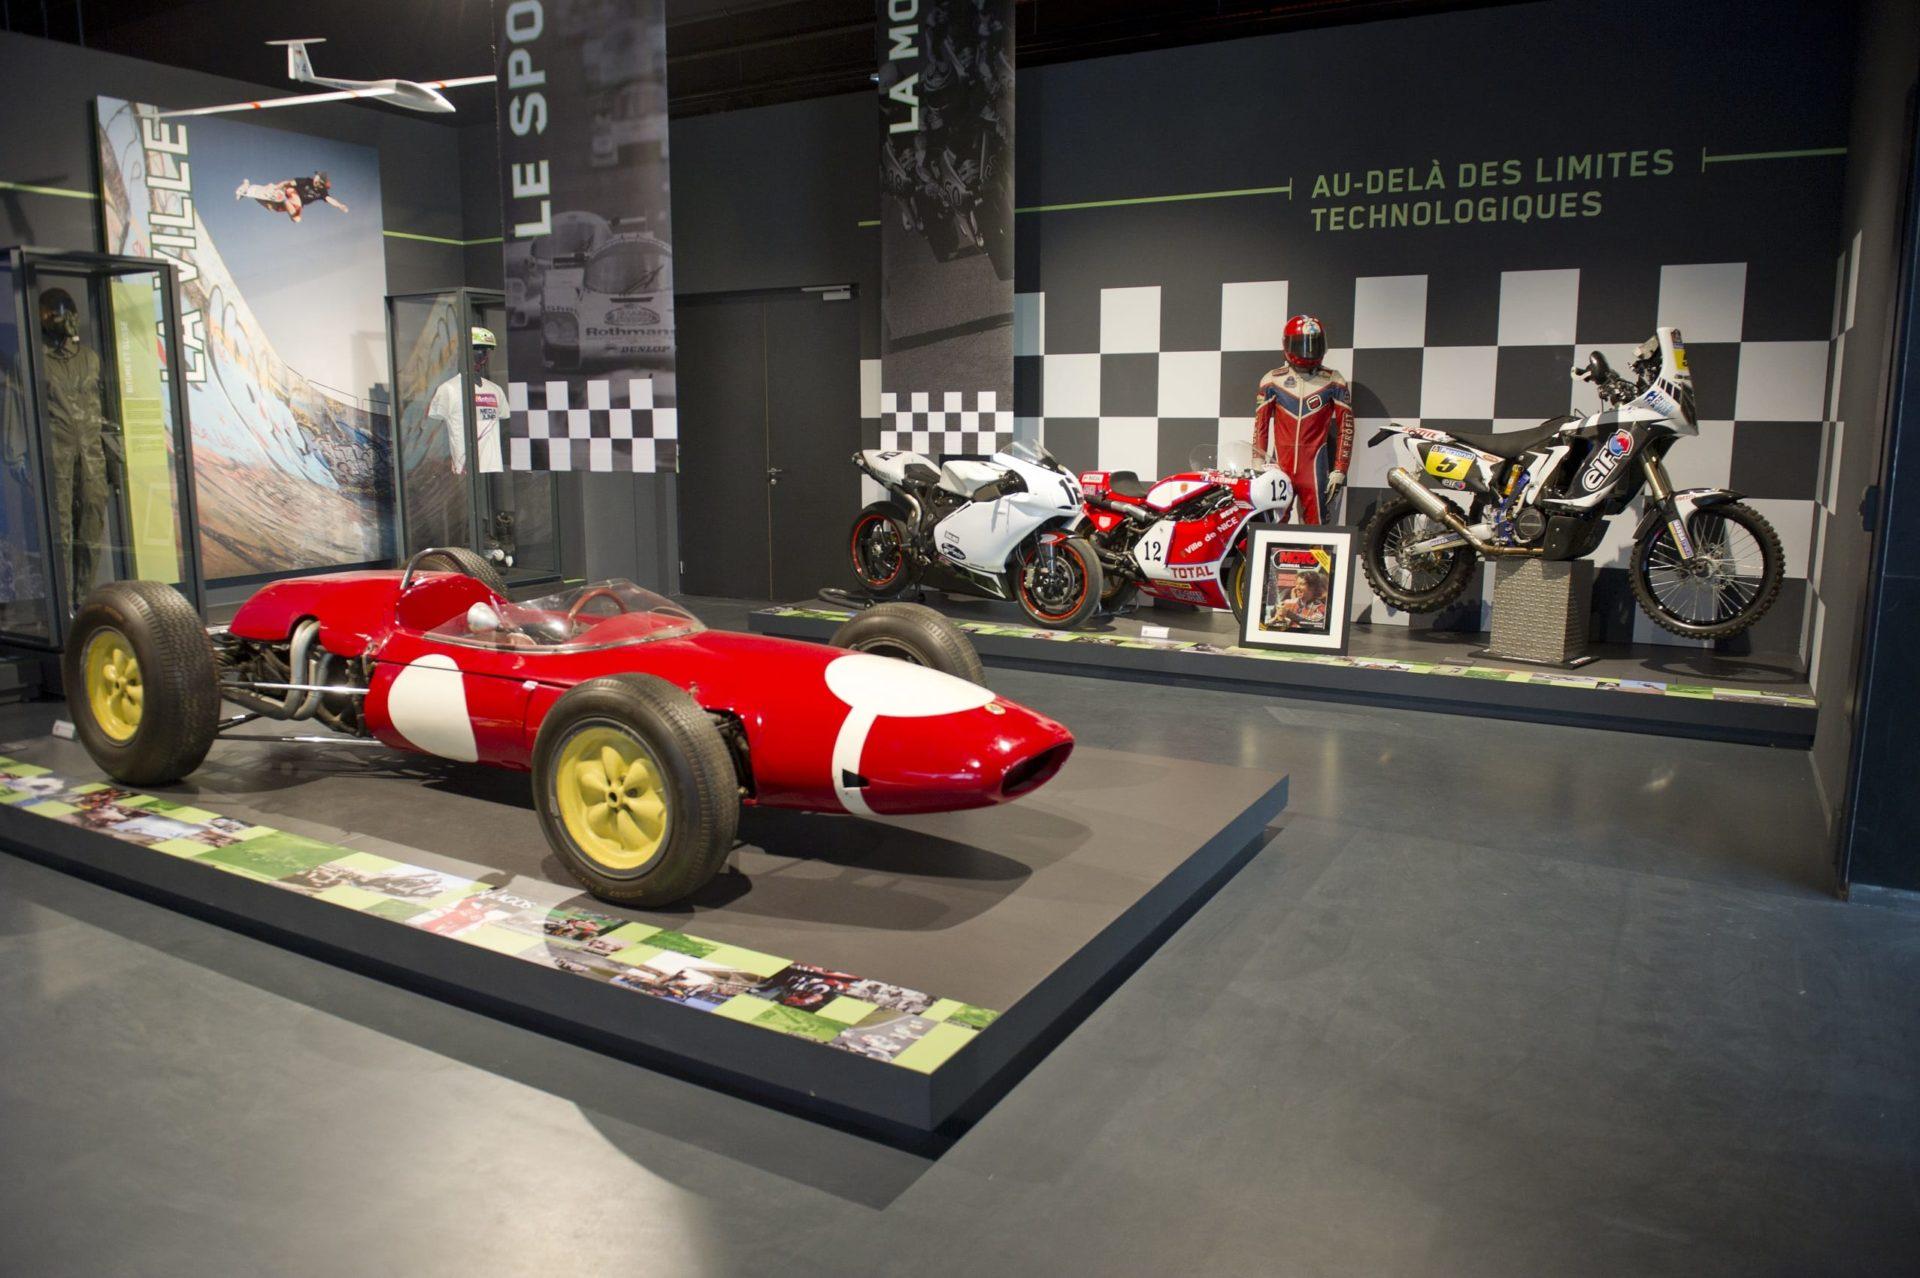 Voiture du Musée national du sport